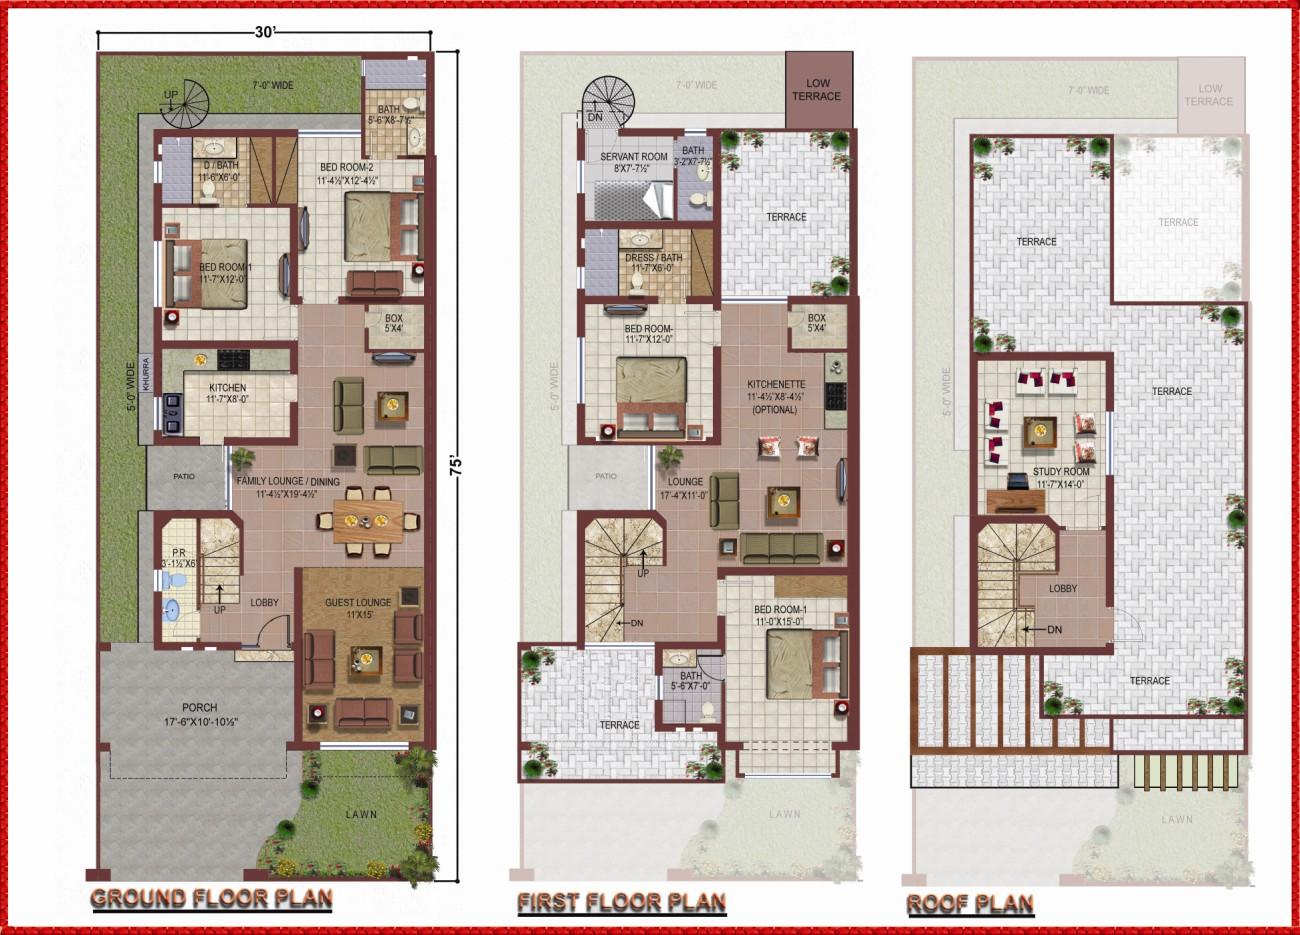 10 Marla House Plan Civil Engineers Pk